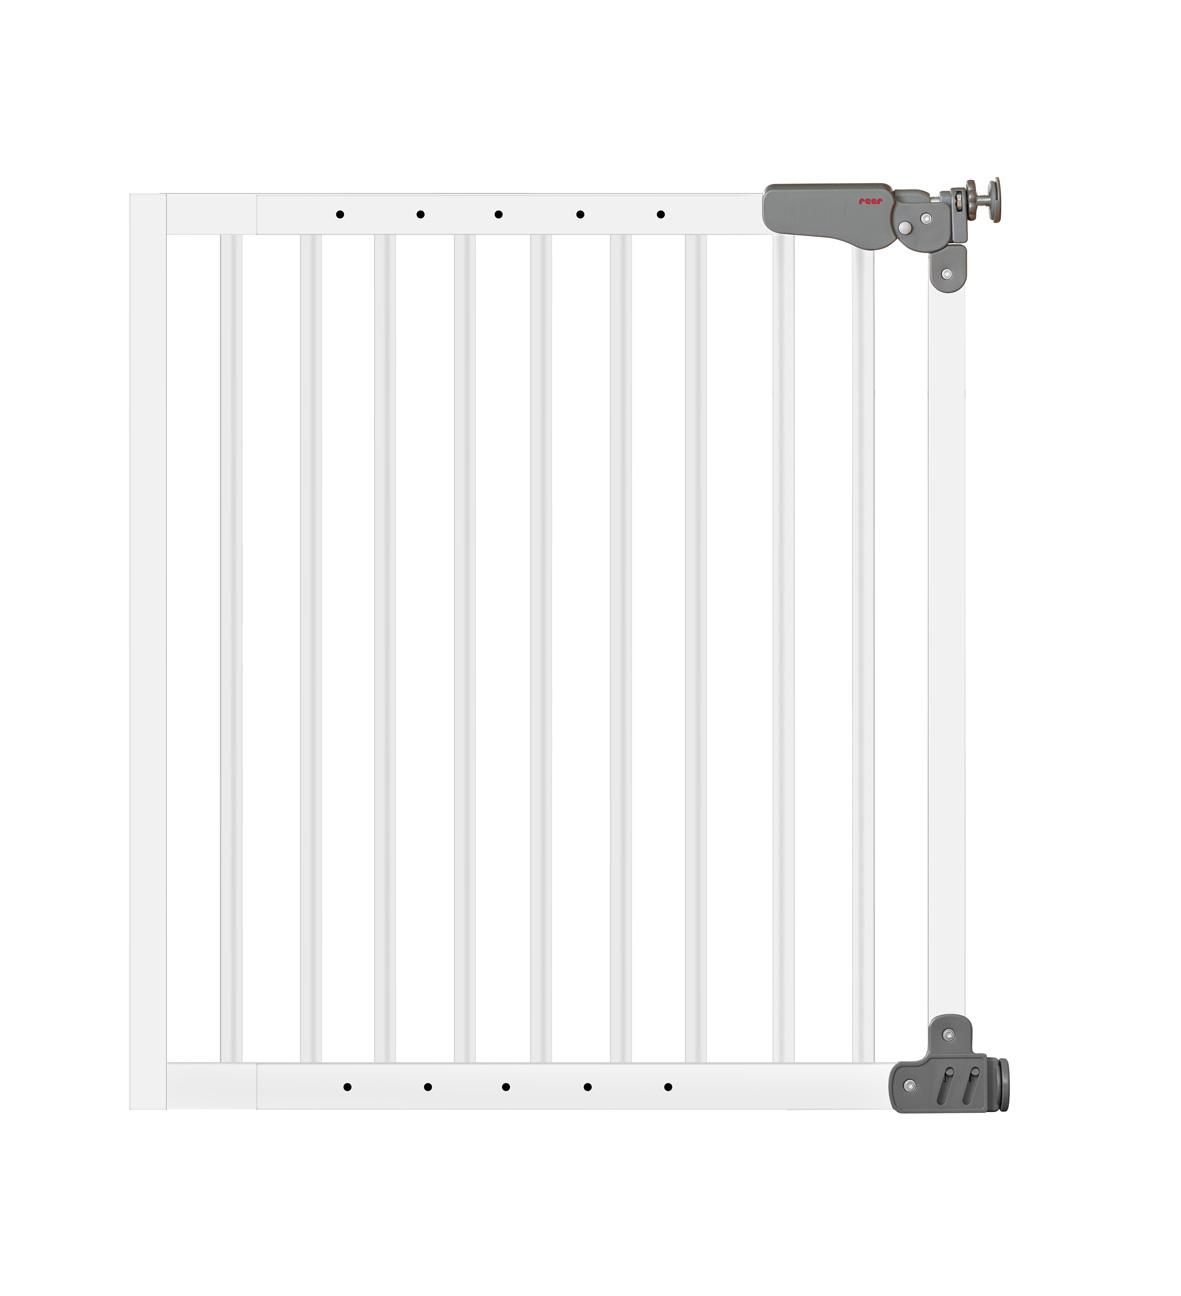 Zábrana do dveří a na schody Reer T Active-Lock kovová